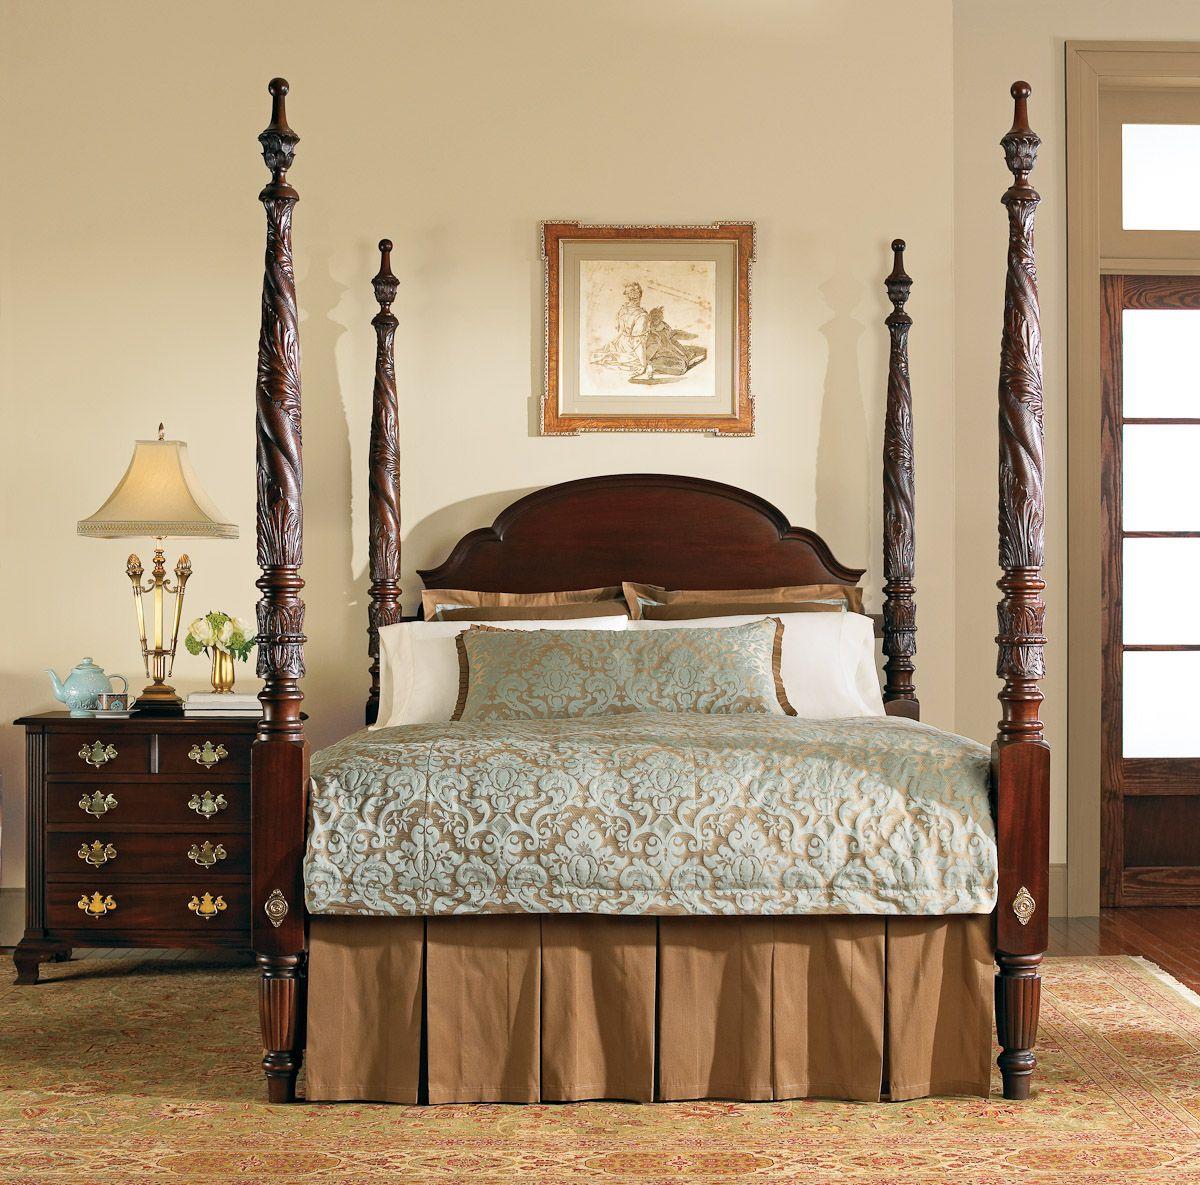 Interior Design Colonial Williamsburg: Stickley Colonial Williamsburg Bed #bedroom